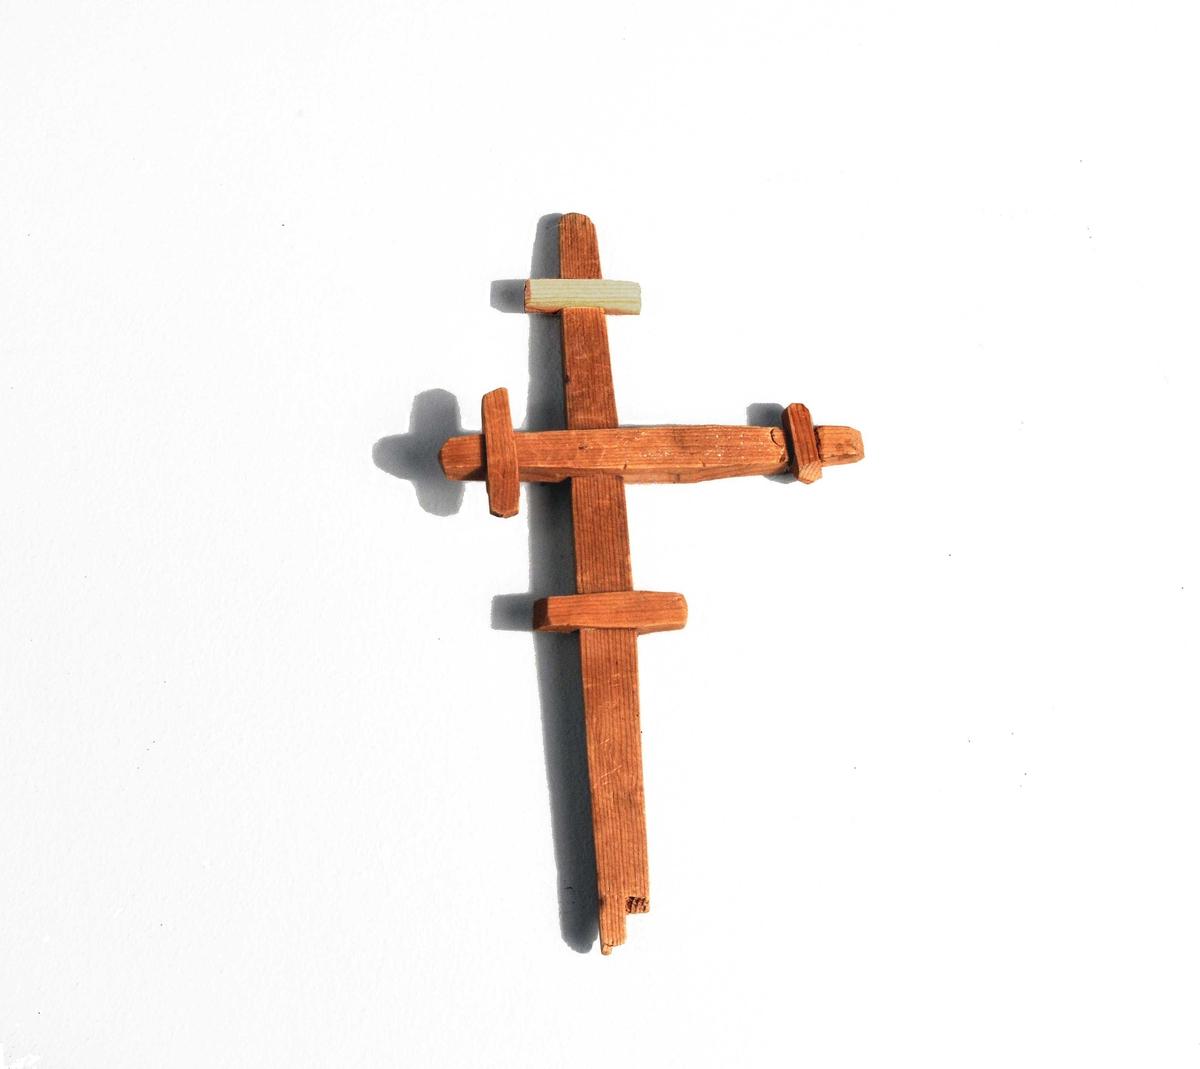 1 Kors av træ.  Kors av furutræ fundet liggende paa en likkiste under gulvet i midskibet, hvor orgelprospektet nu er reist. Korstet har tre tverarmer. Dette kors er utvivlsomt stukket under kirkegulvet i en eller anden overtroisk hensigt. Længde 17,6 cm, midterste tverarms længde 9,5 cm.  Ovennevnte gjenstander (12036 - 51) fundet ved min undersökelse av likkjelderen i Aurlands Kirke og gave fra Aurland Sognestyre.